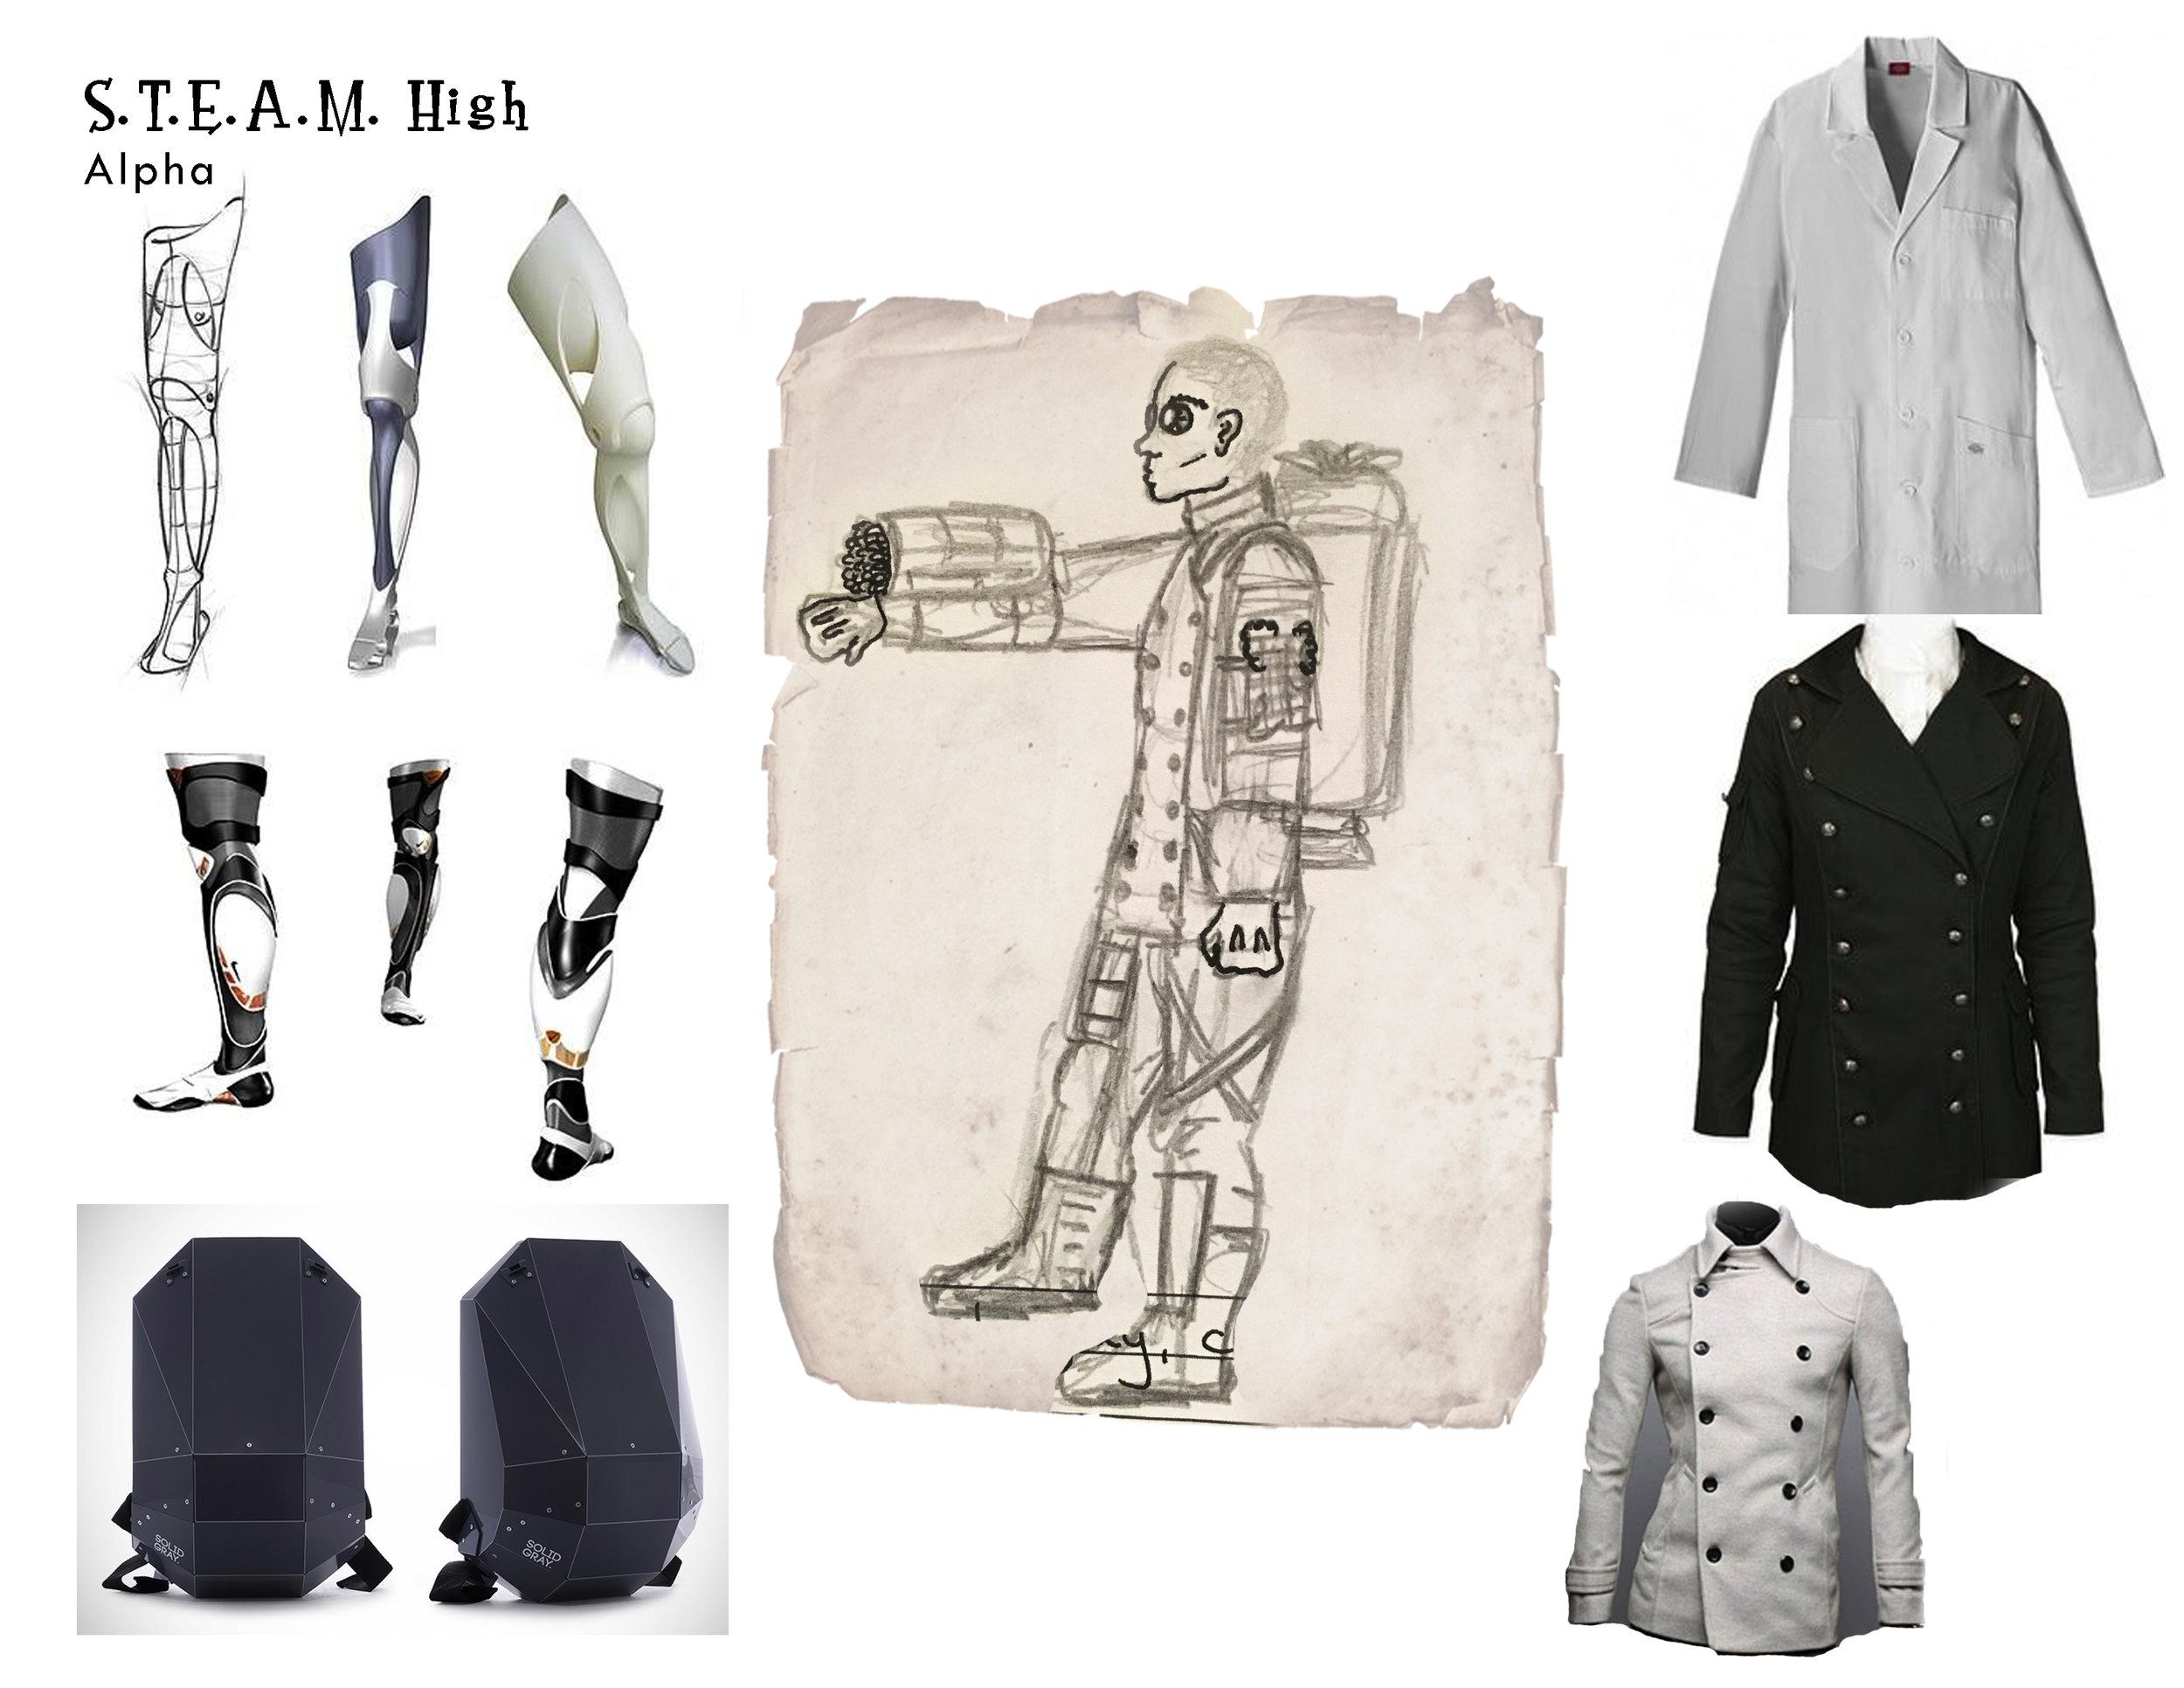 S.T.E.A.M. High Alpha Concepts.jpg